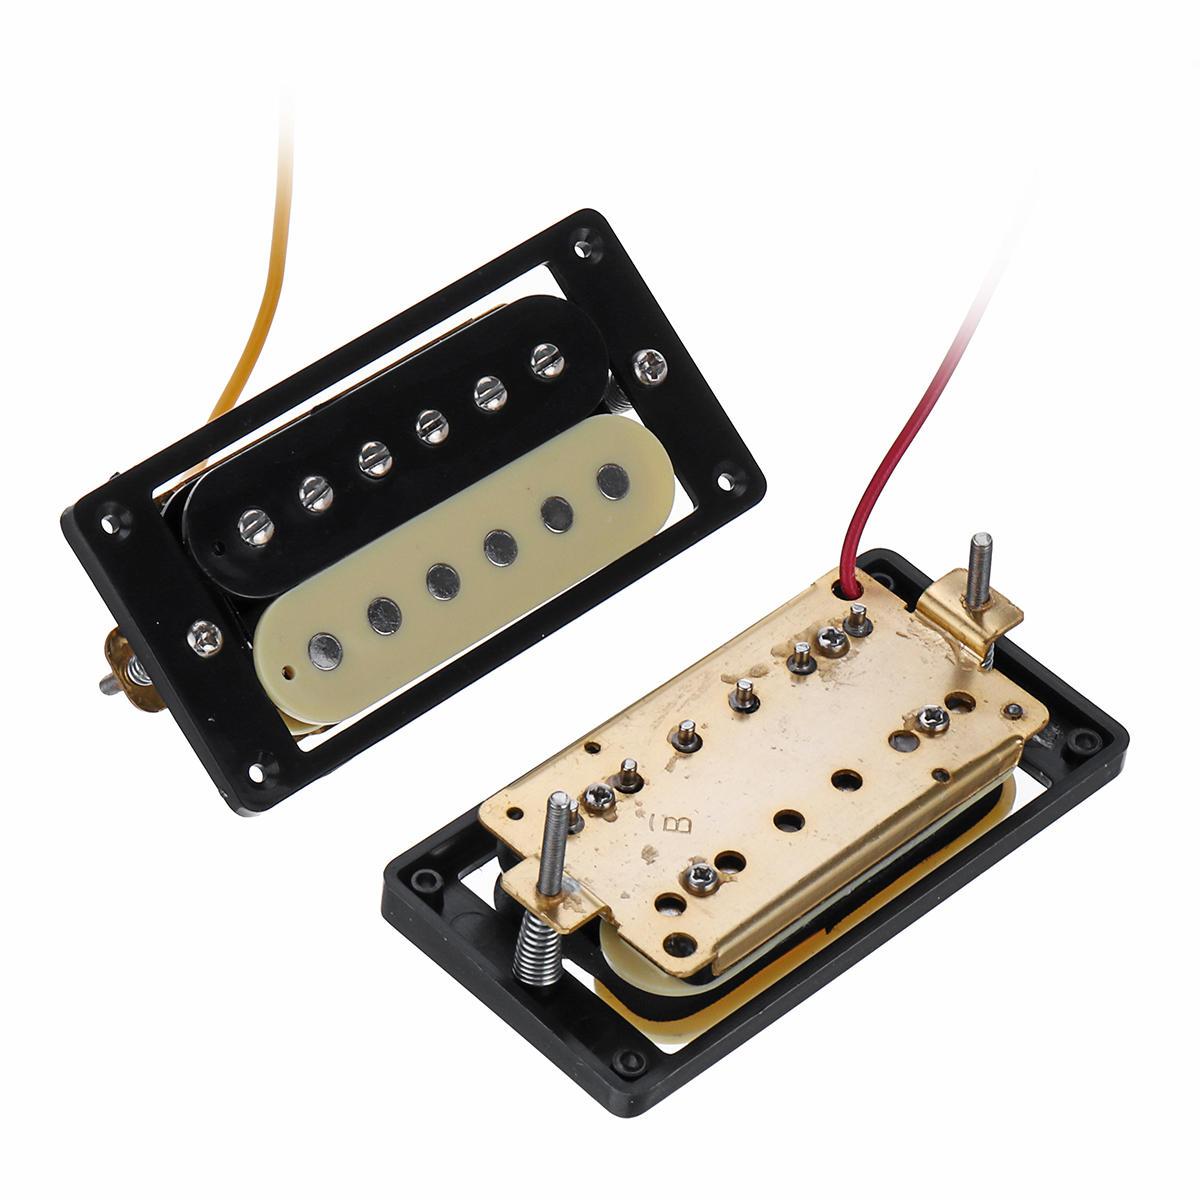 2pcs Double Coil Humbucker Guitar Pickup for Zebra/Ibana Electric Guitar